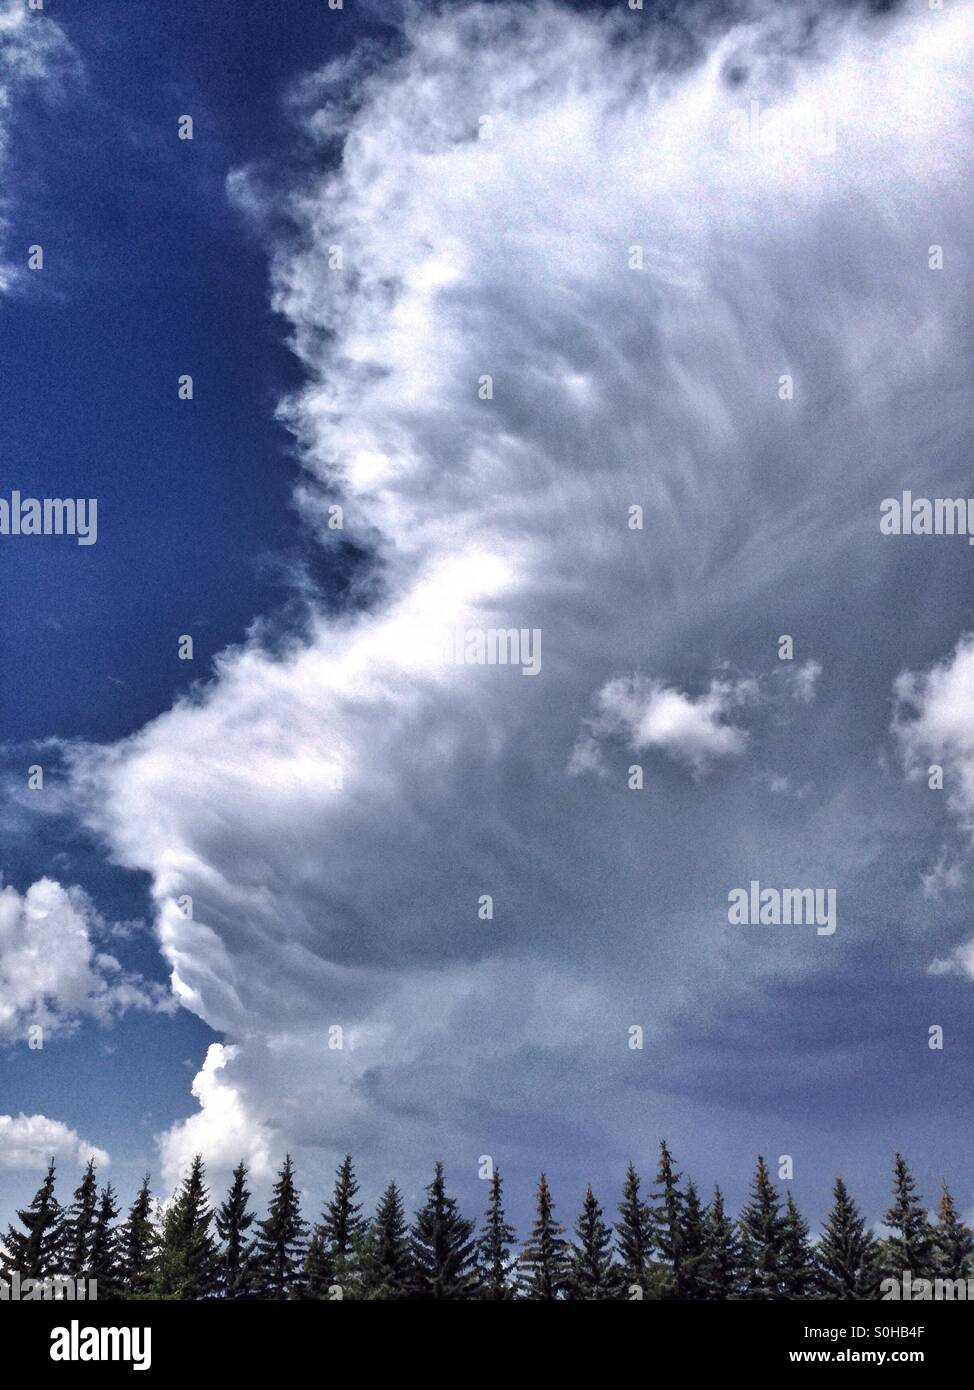 The edge of a large Cumulonimbus cloud above a line of fir trees. Calgary, Alberta, Canada. July 2015. - Stock Image